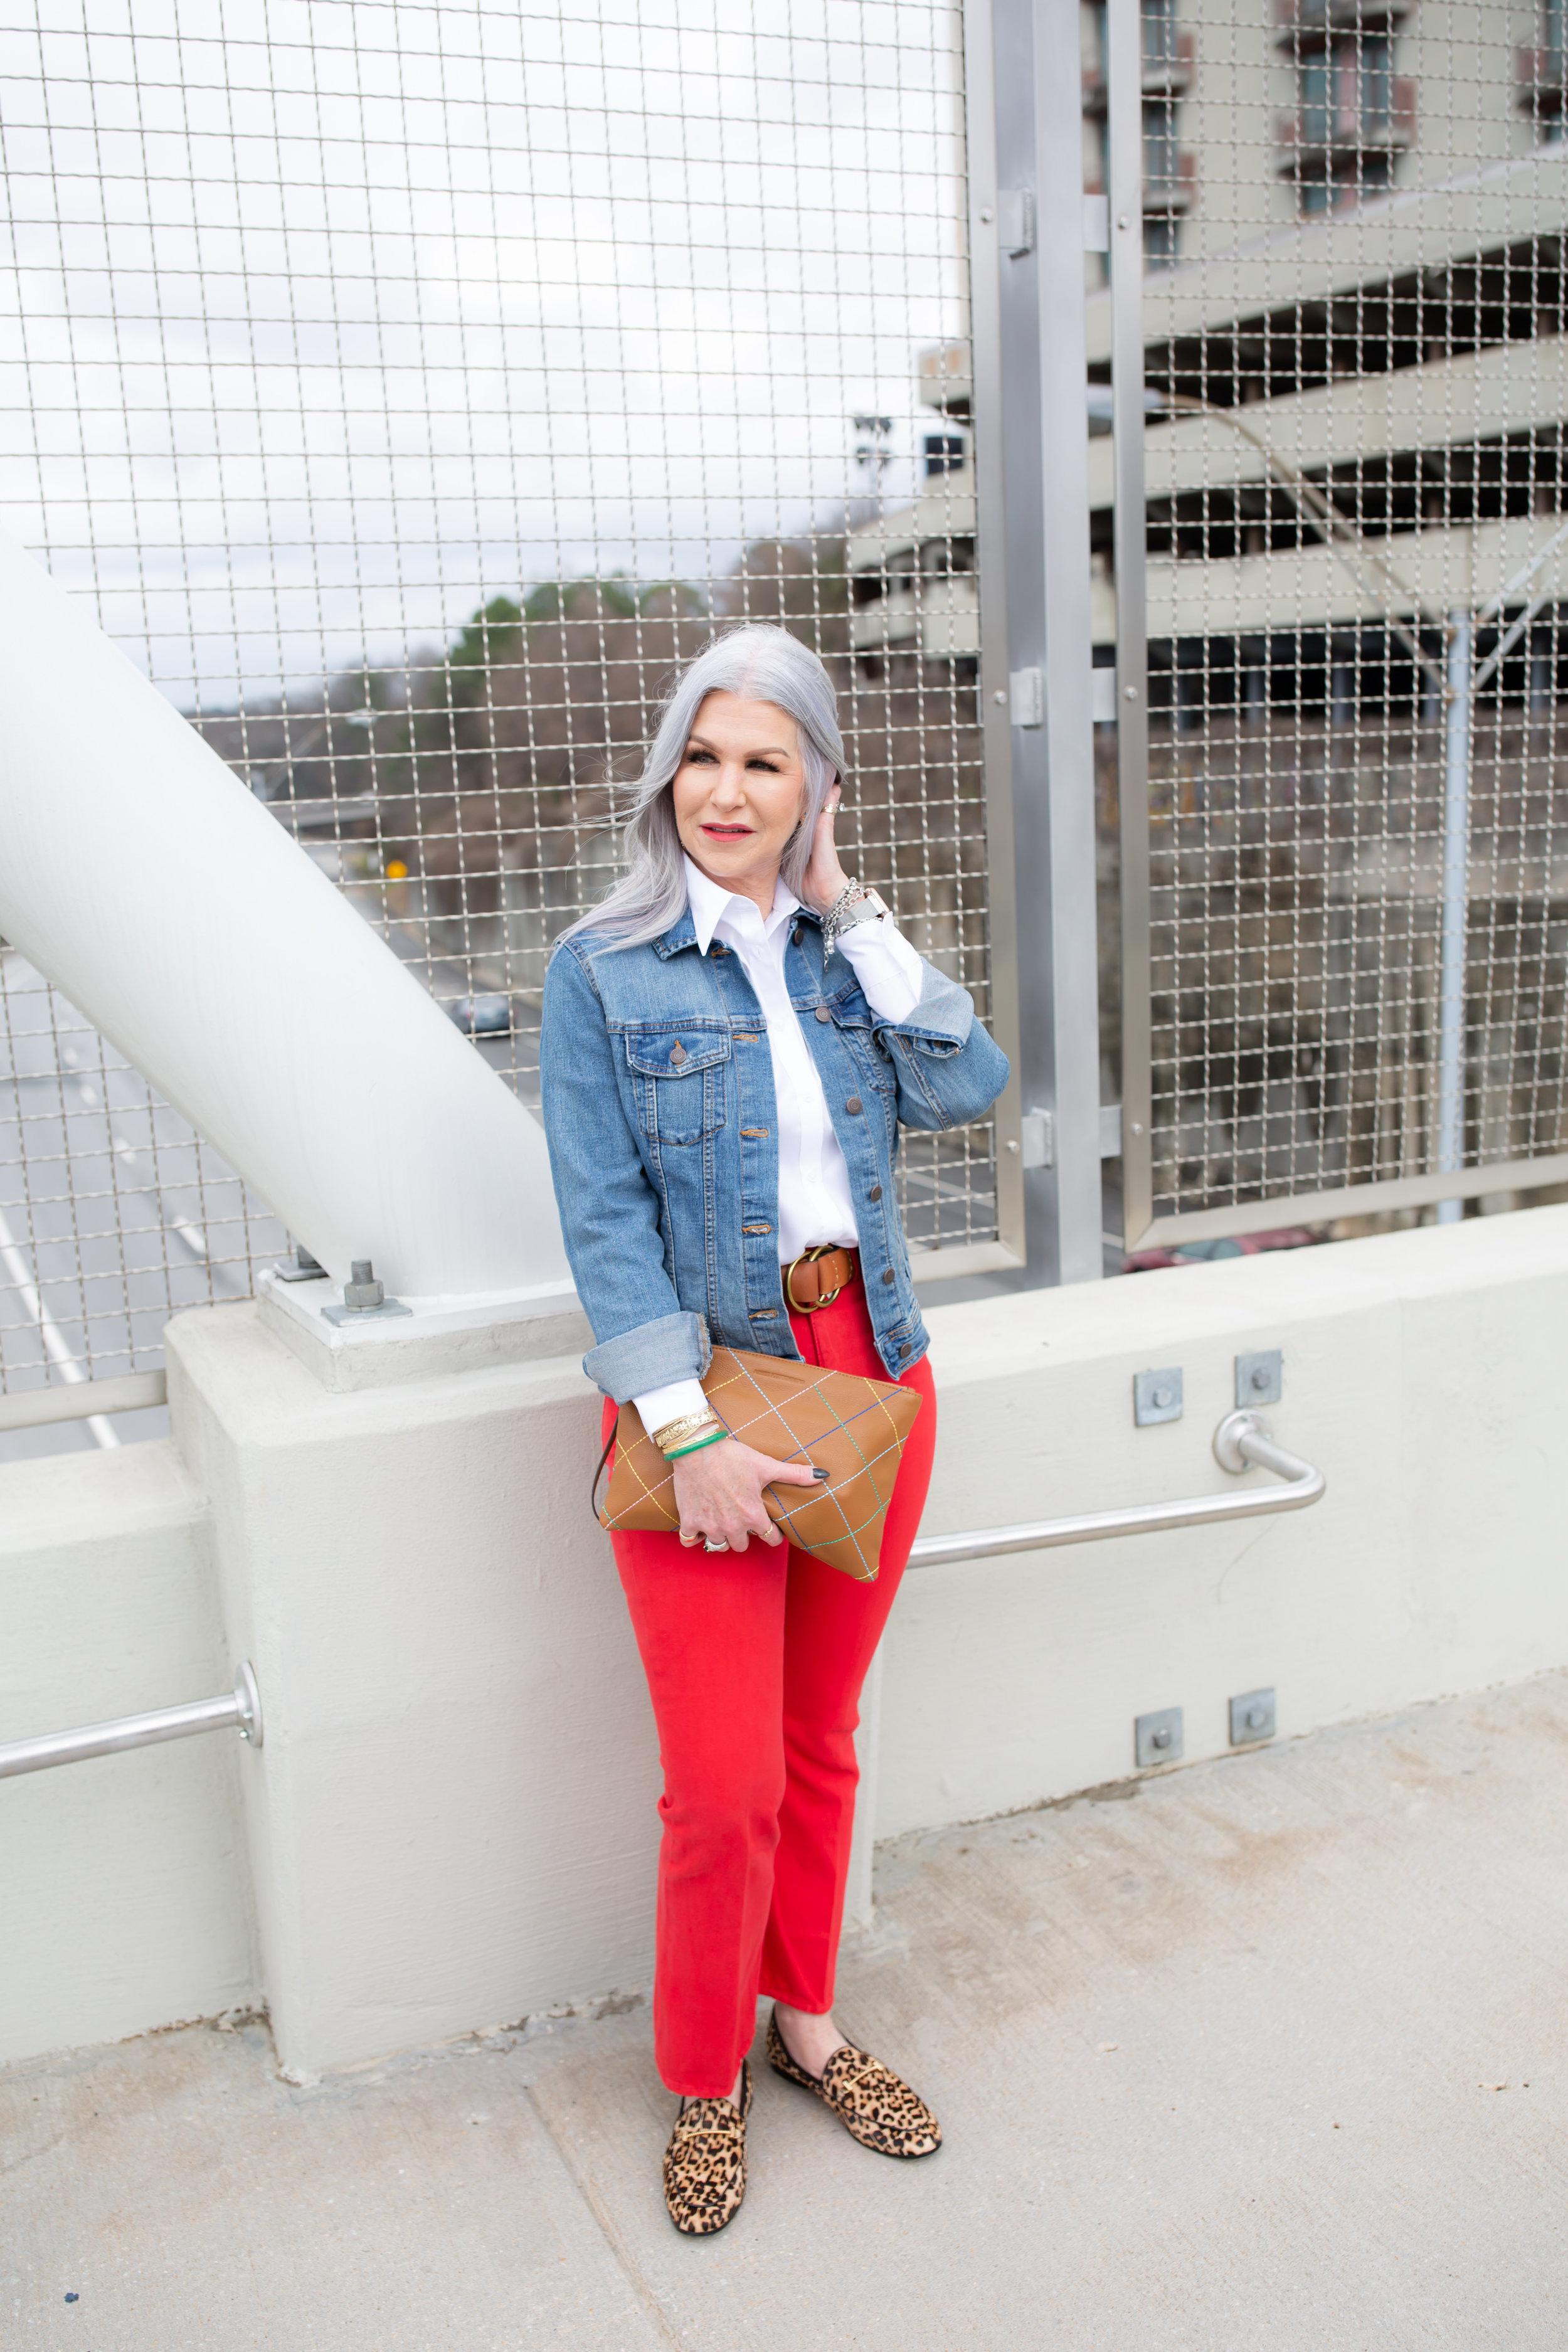 Lisa Hale February 2 2019-28.jpg